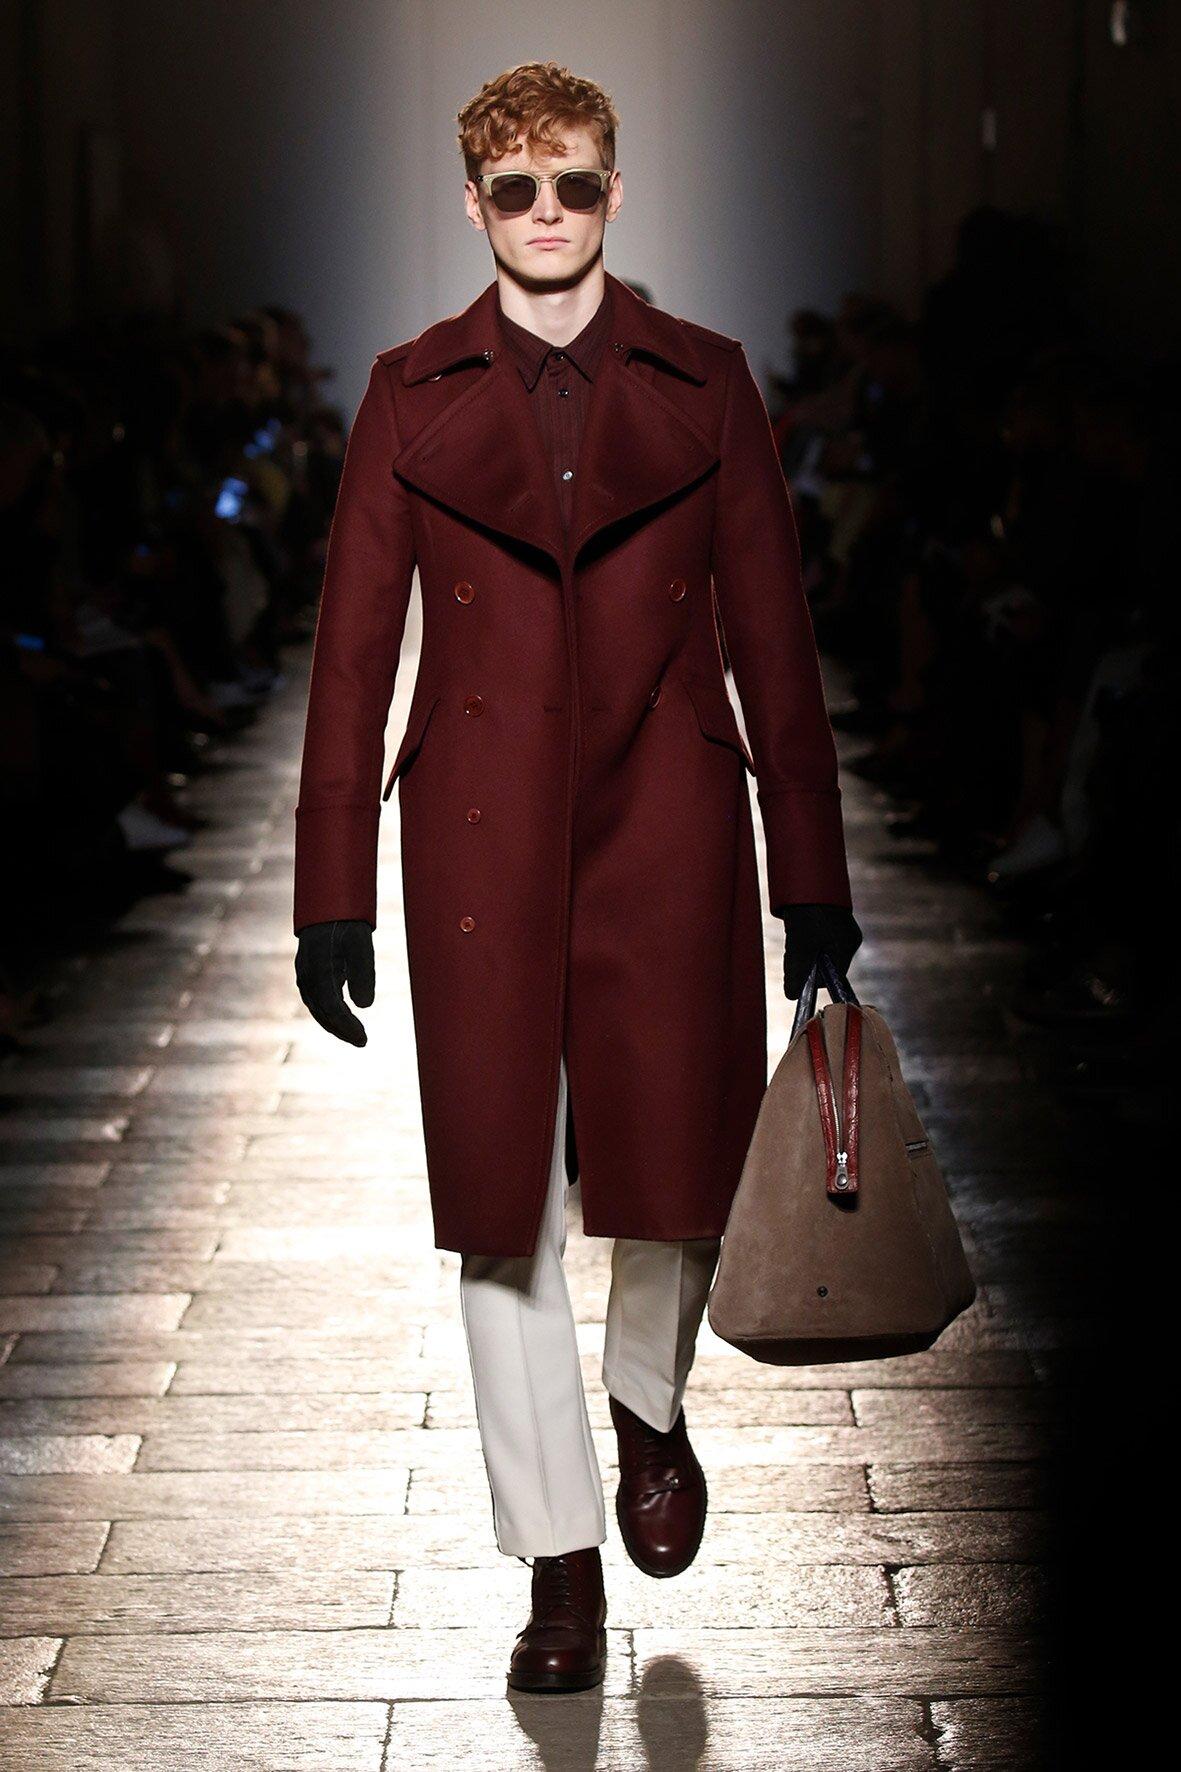 Bottega Veneta Men's Collection 2017